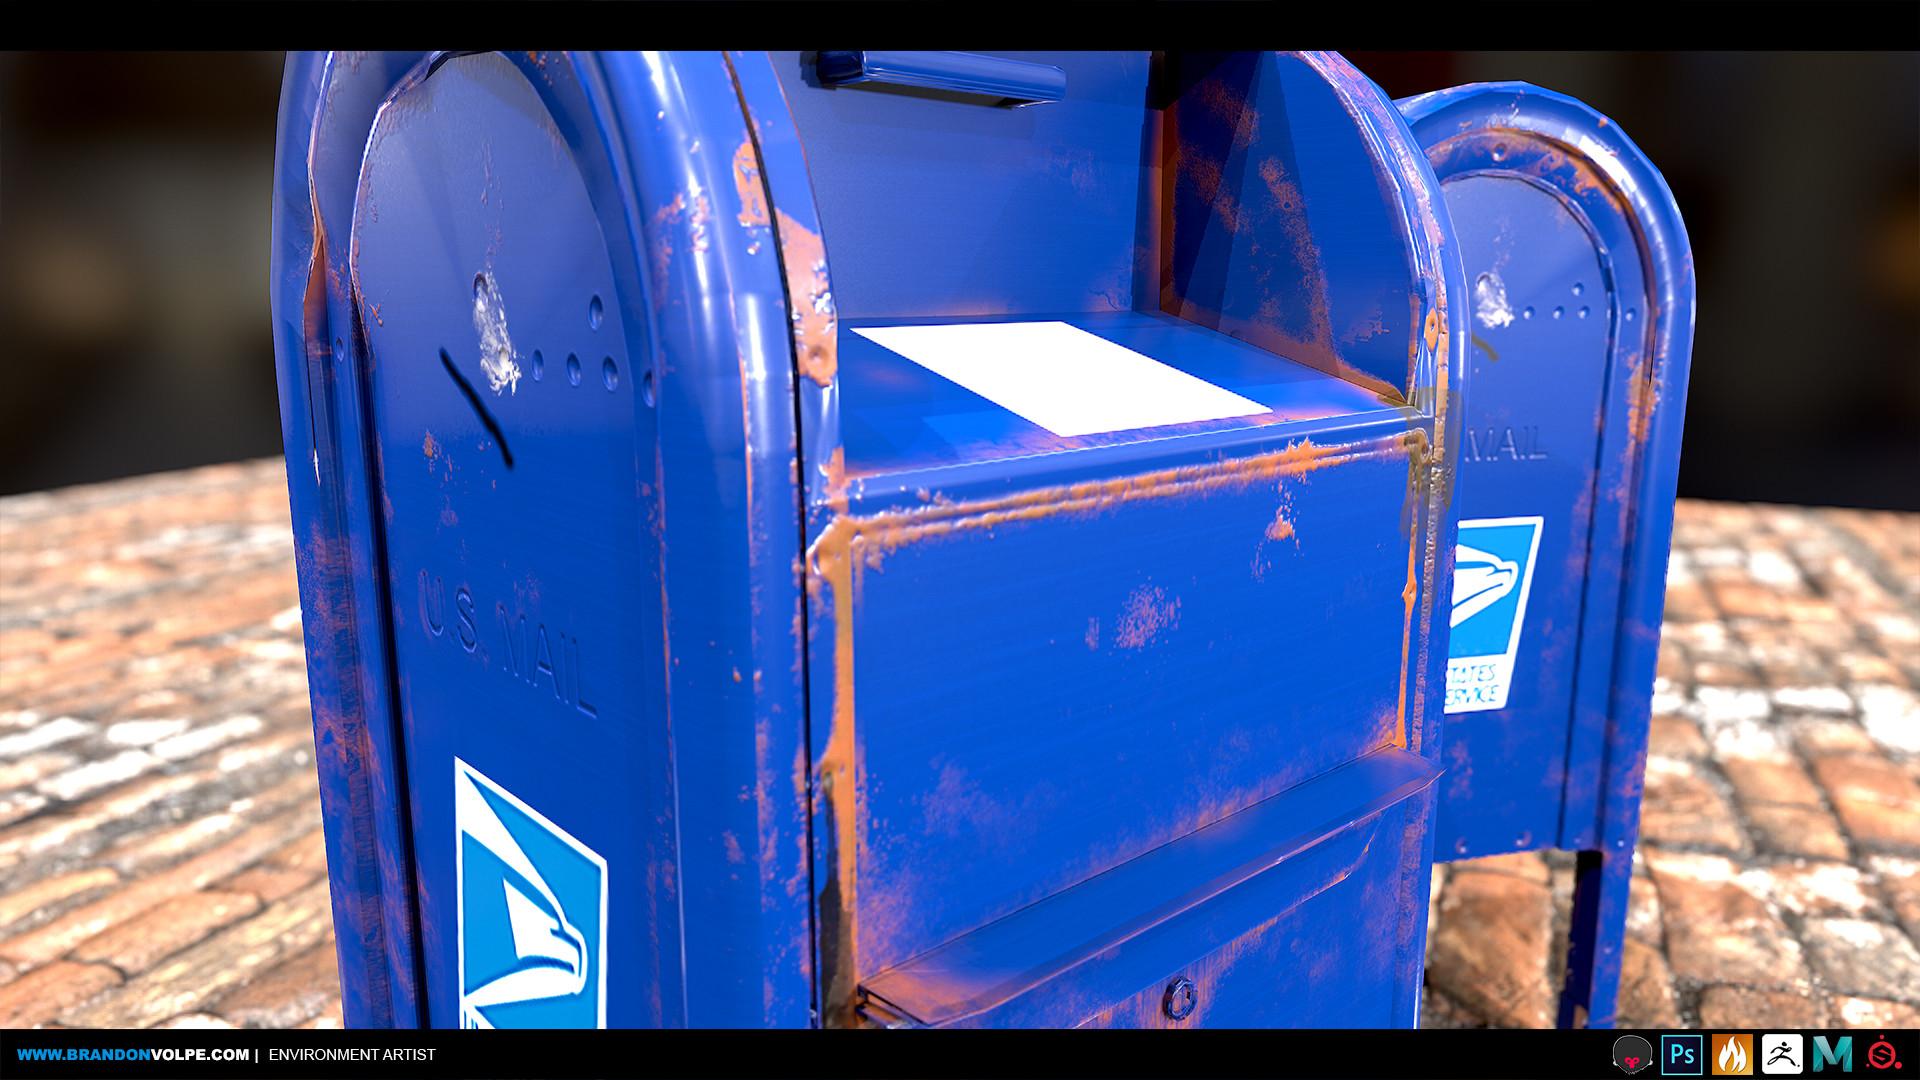 Brandon volpe brandon volpe mailbox 4